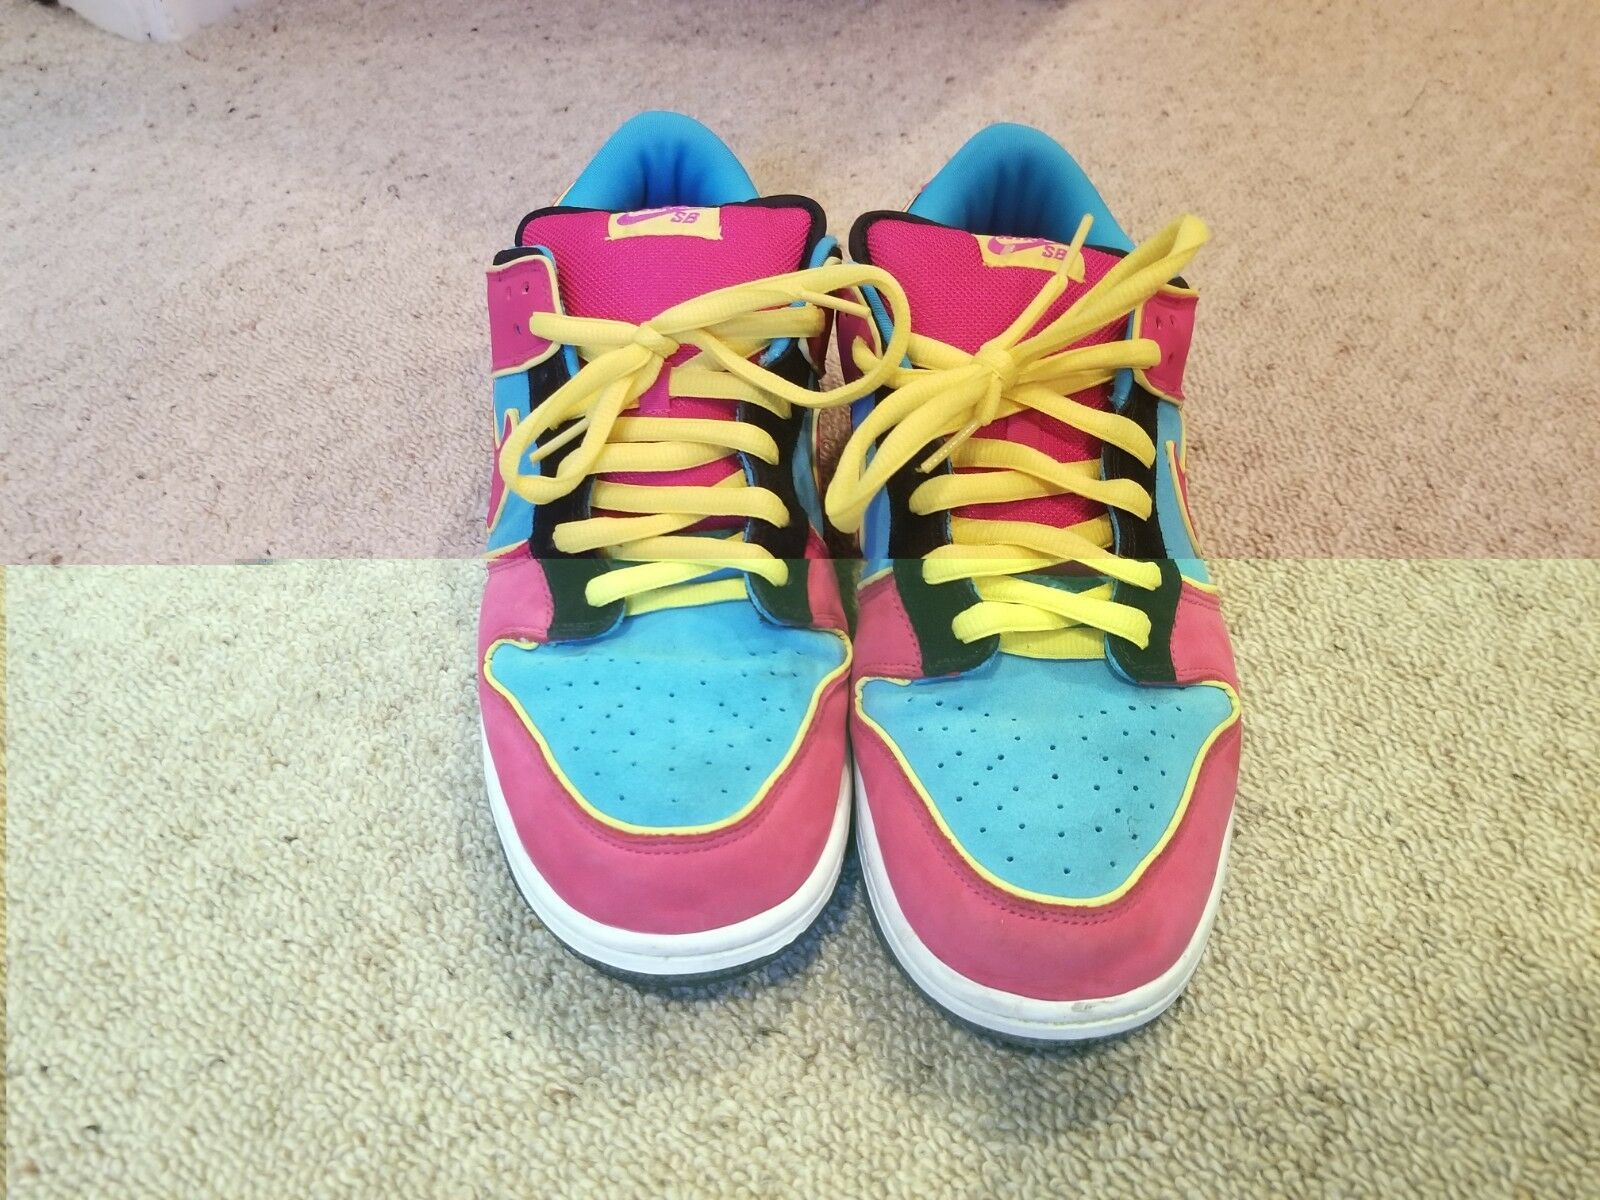 Nike SB Dunk Low Premium Ms Pacman - size 13